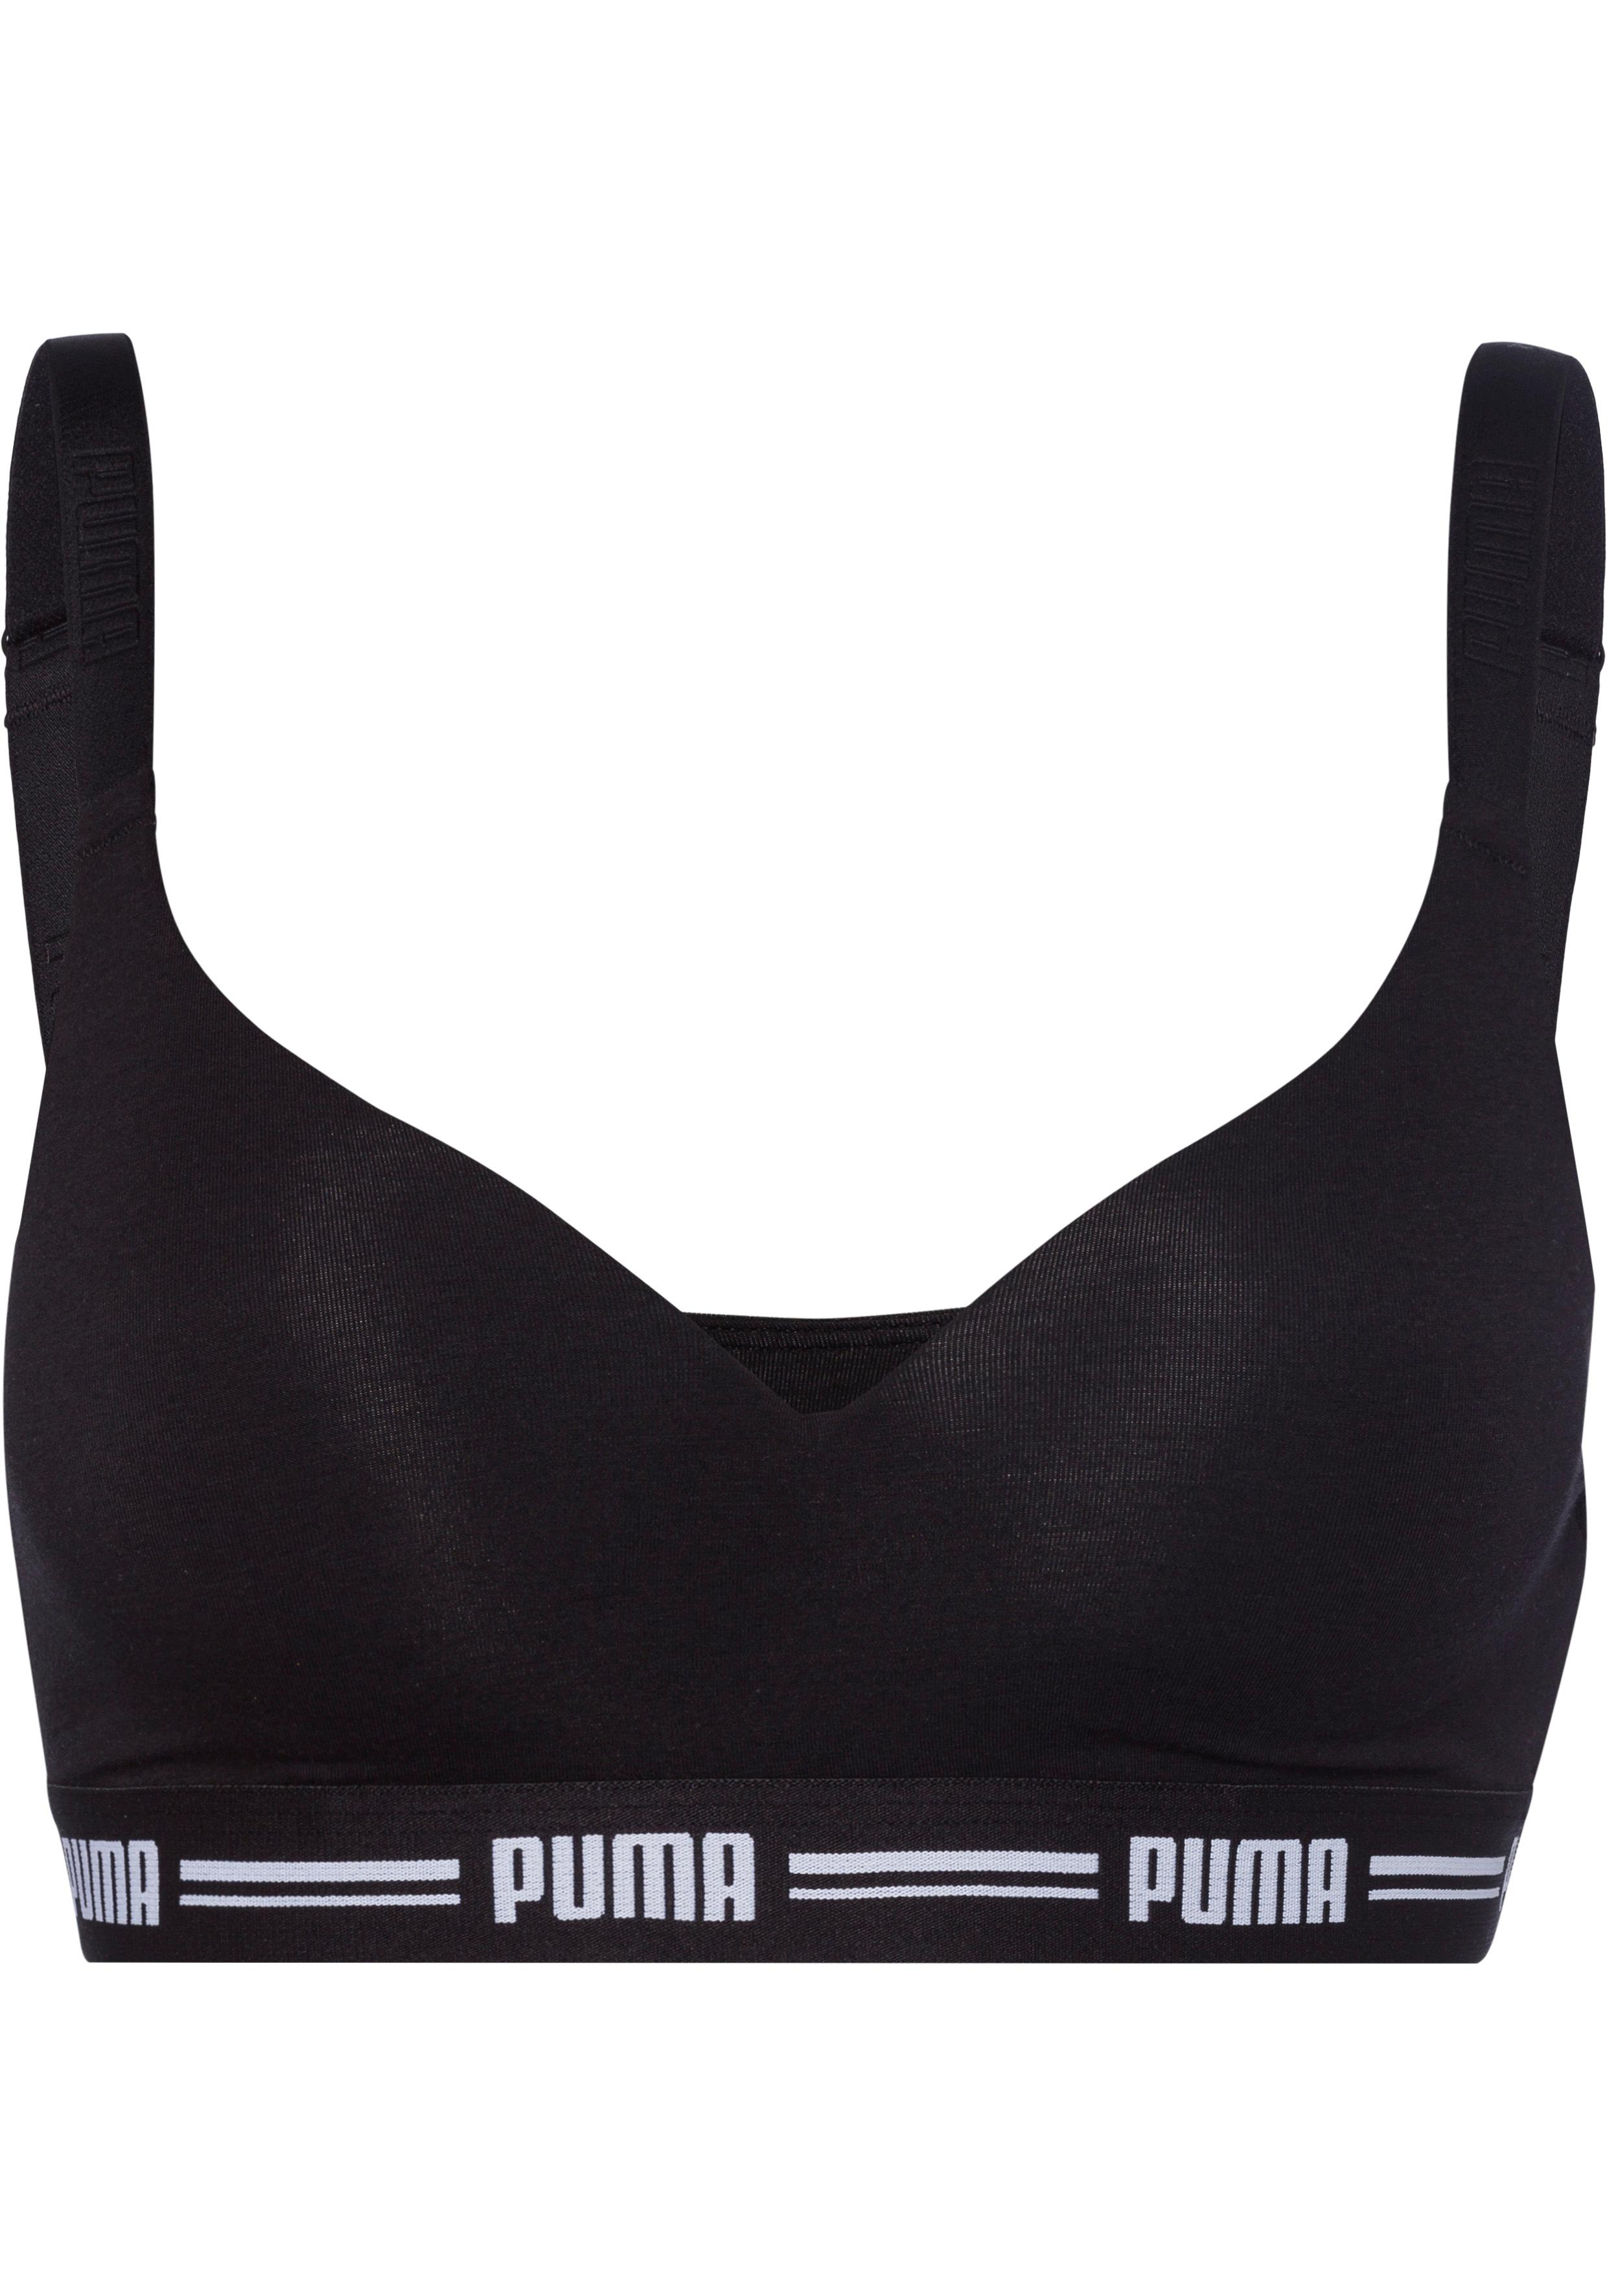 PUMA Bralette-BH »Iconic«